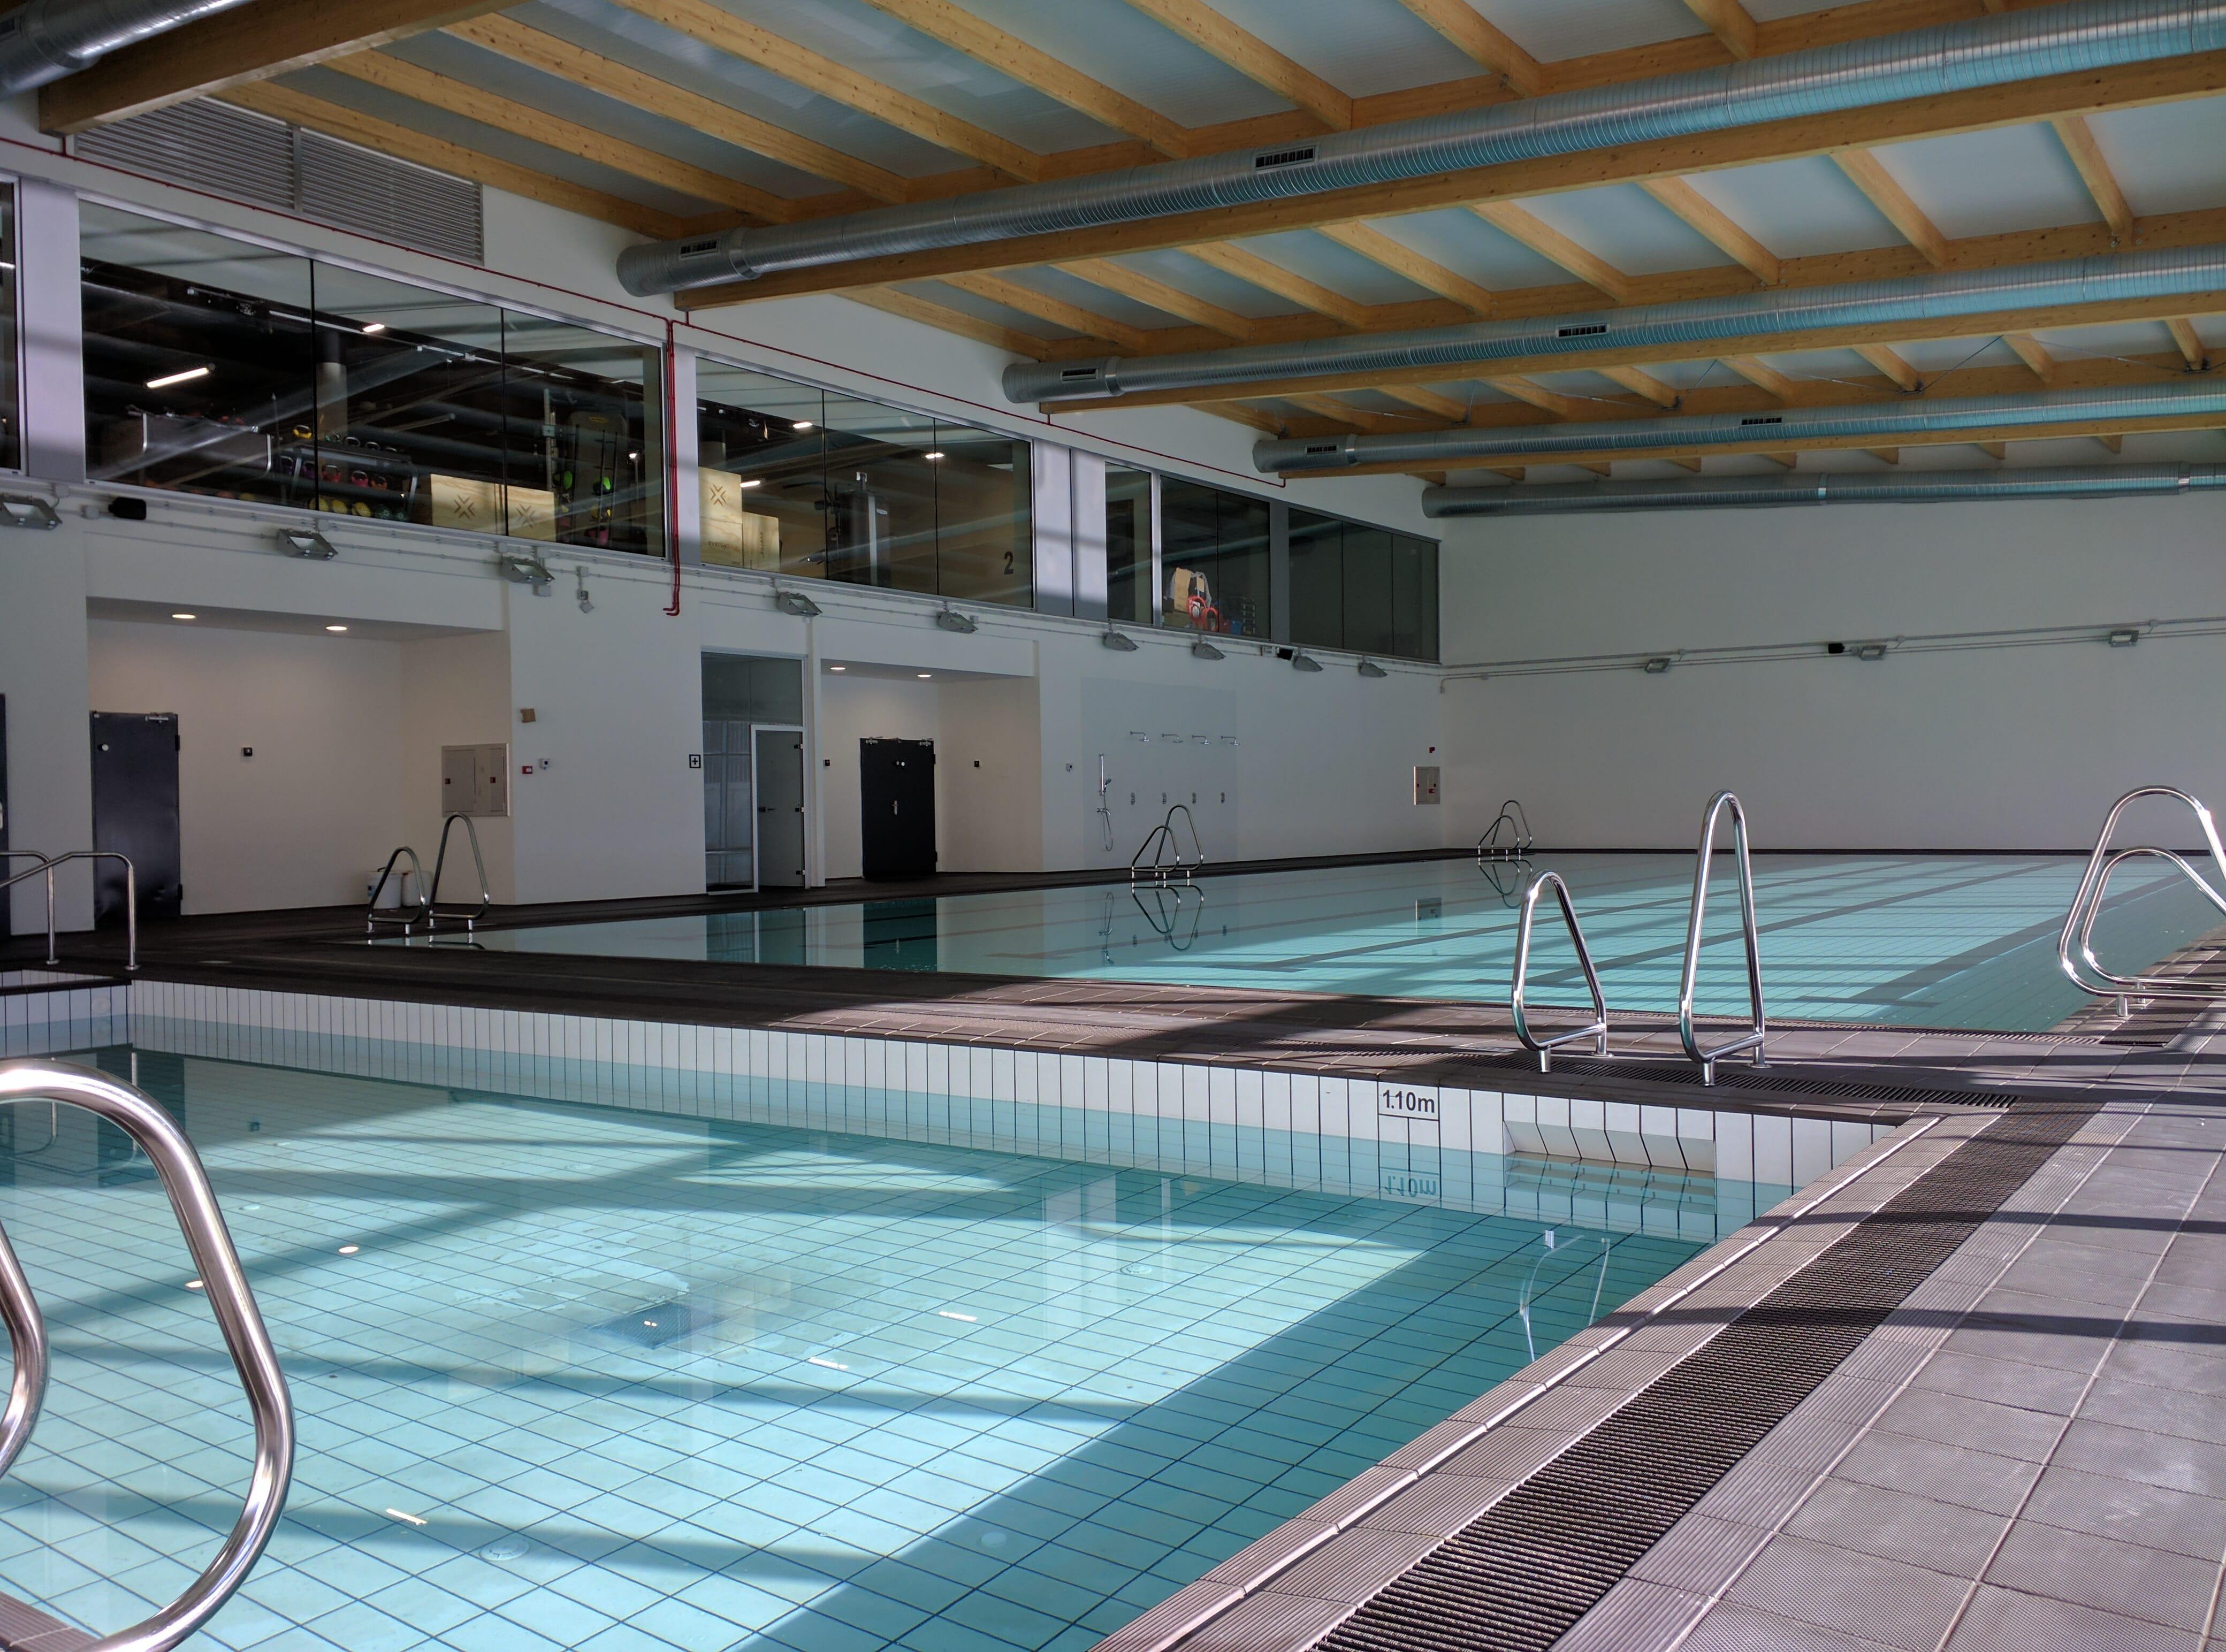 Fin de obra go fit santander opincan for Go fit piscinas san miguel